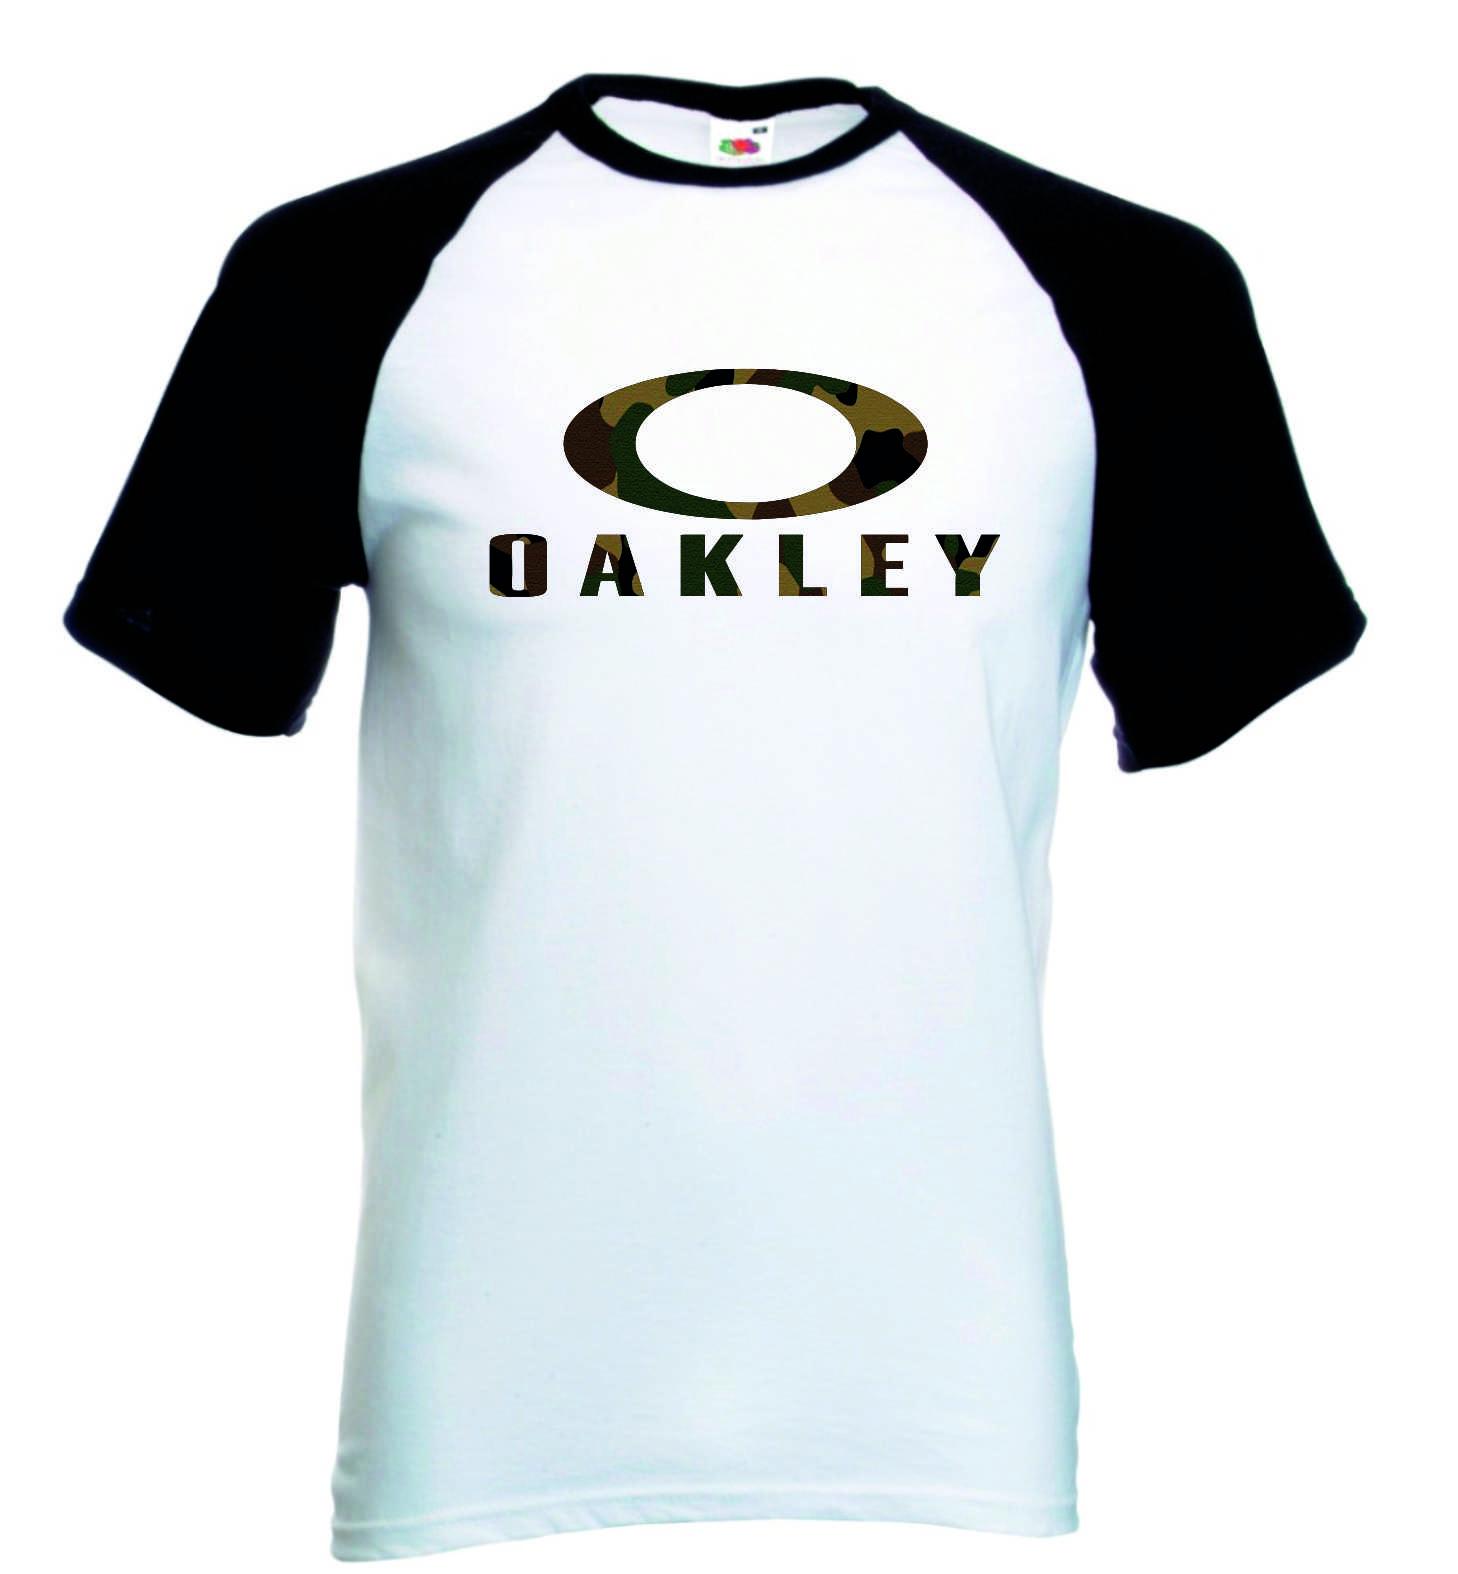 fbe1550a47 Camiseta Oakley